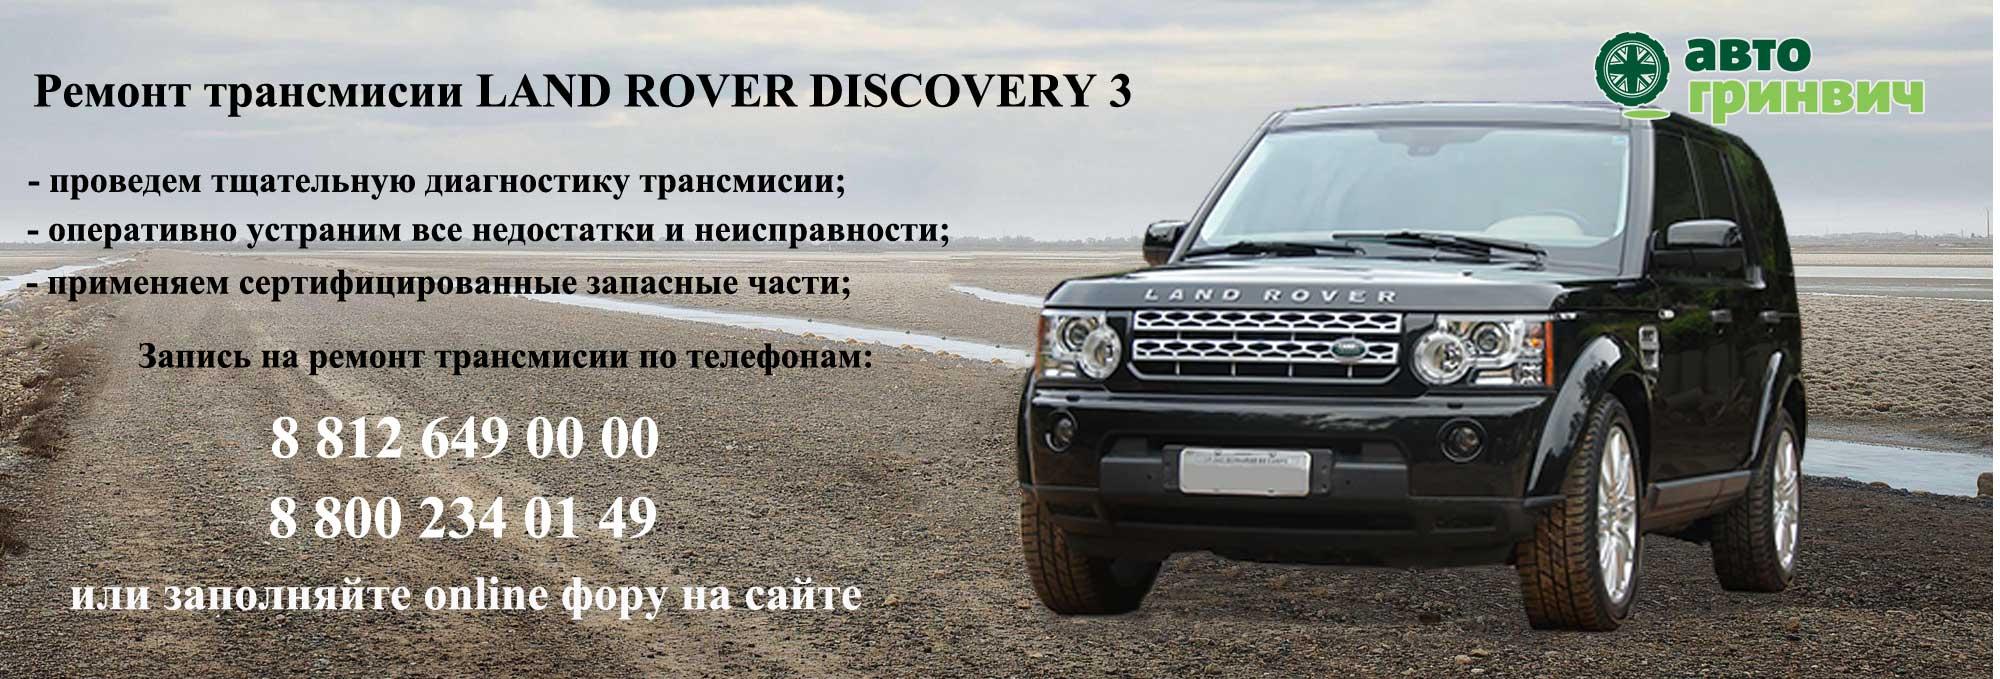 Ремонт трансмиссии Discovery 4